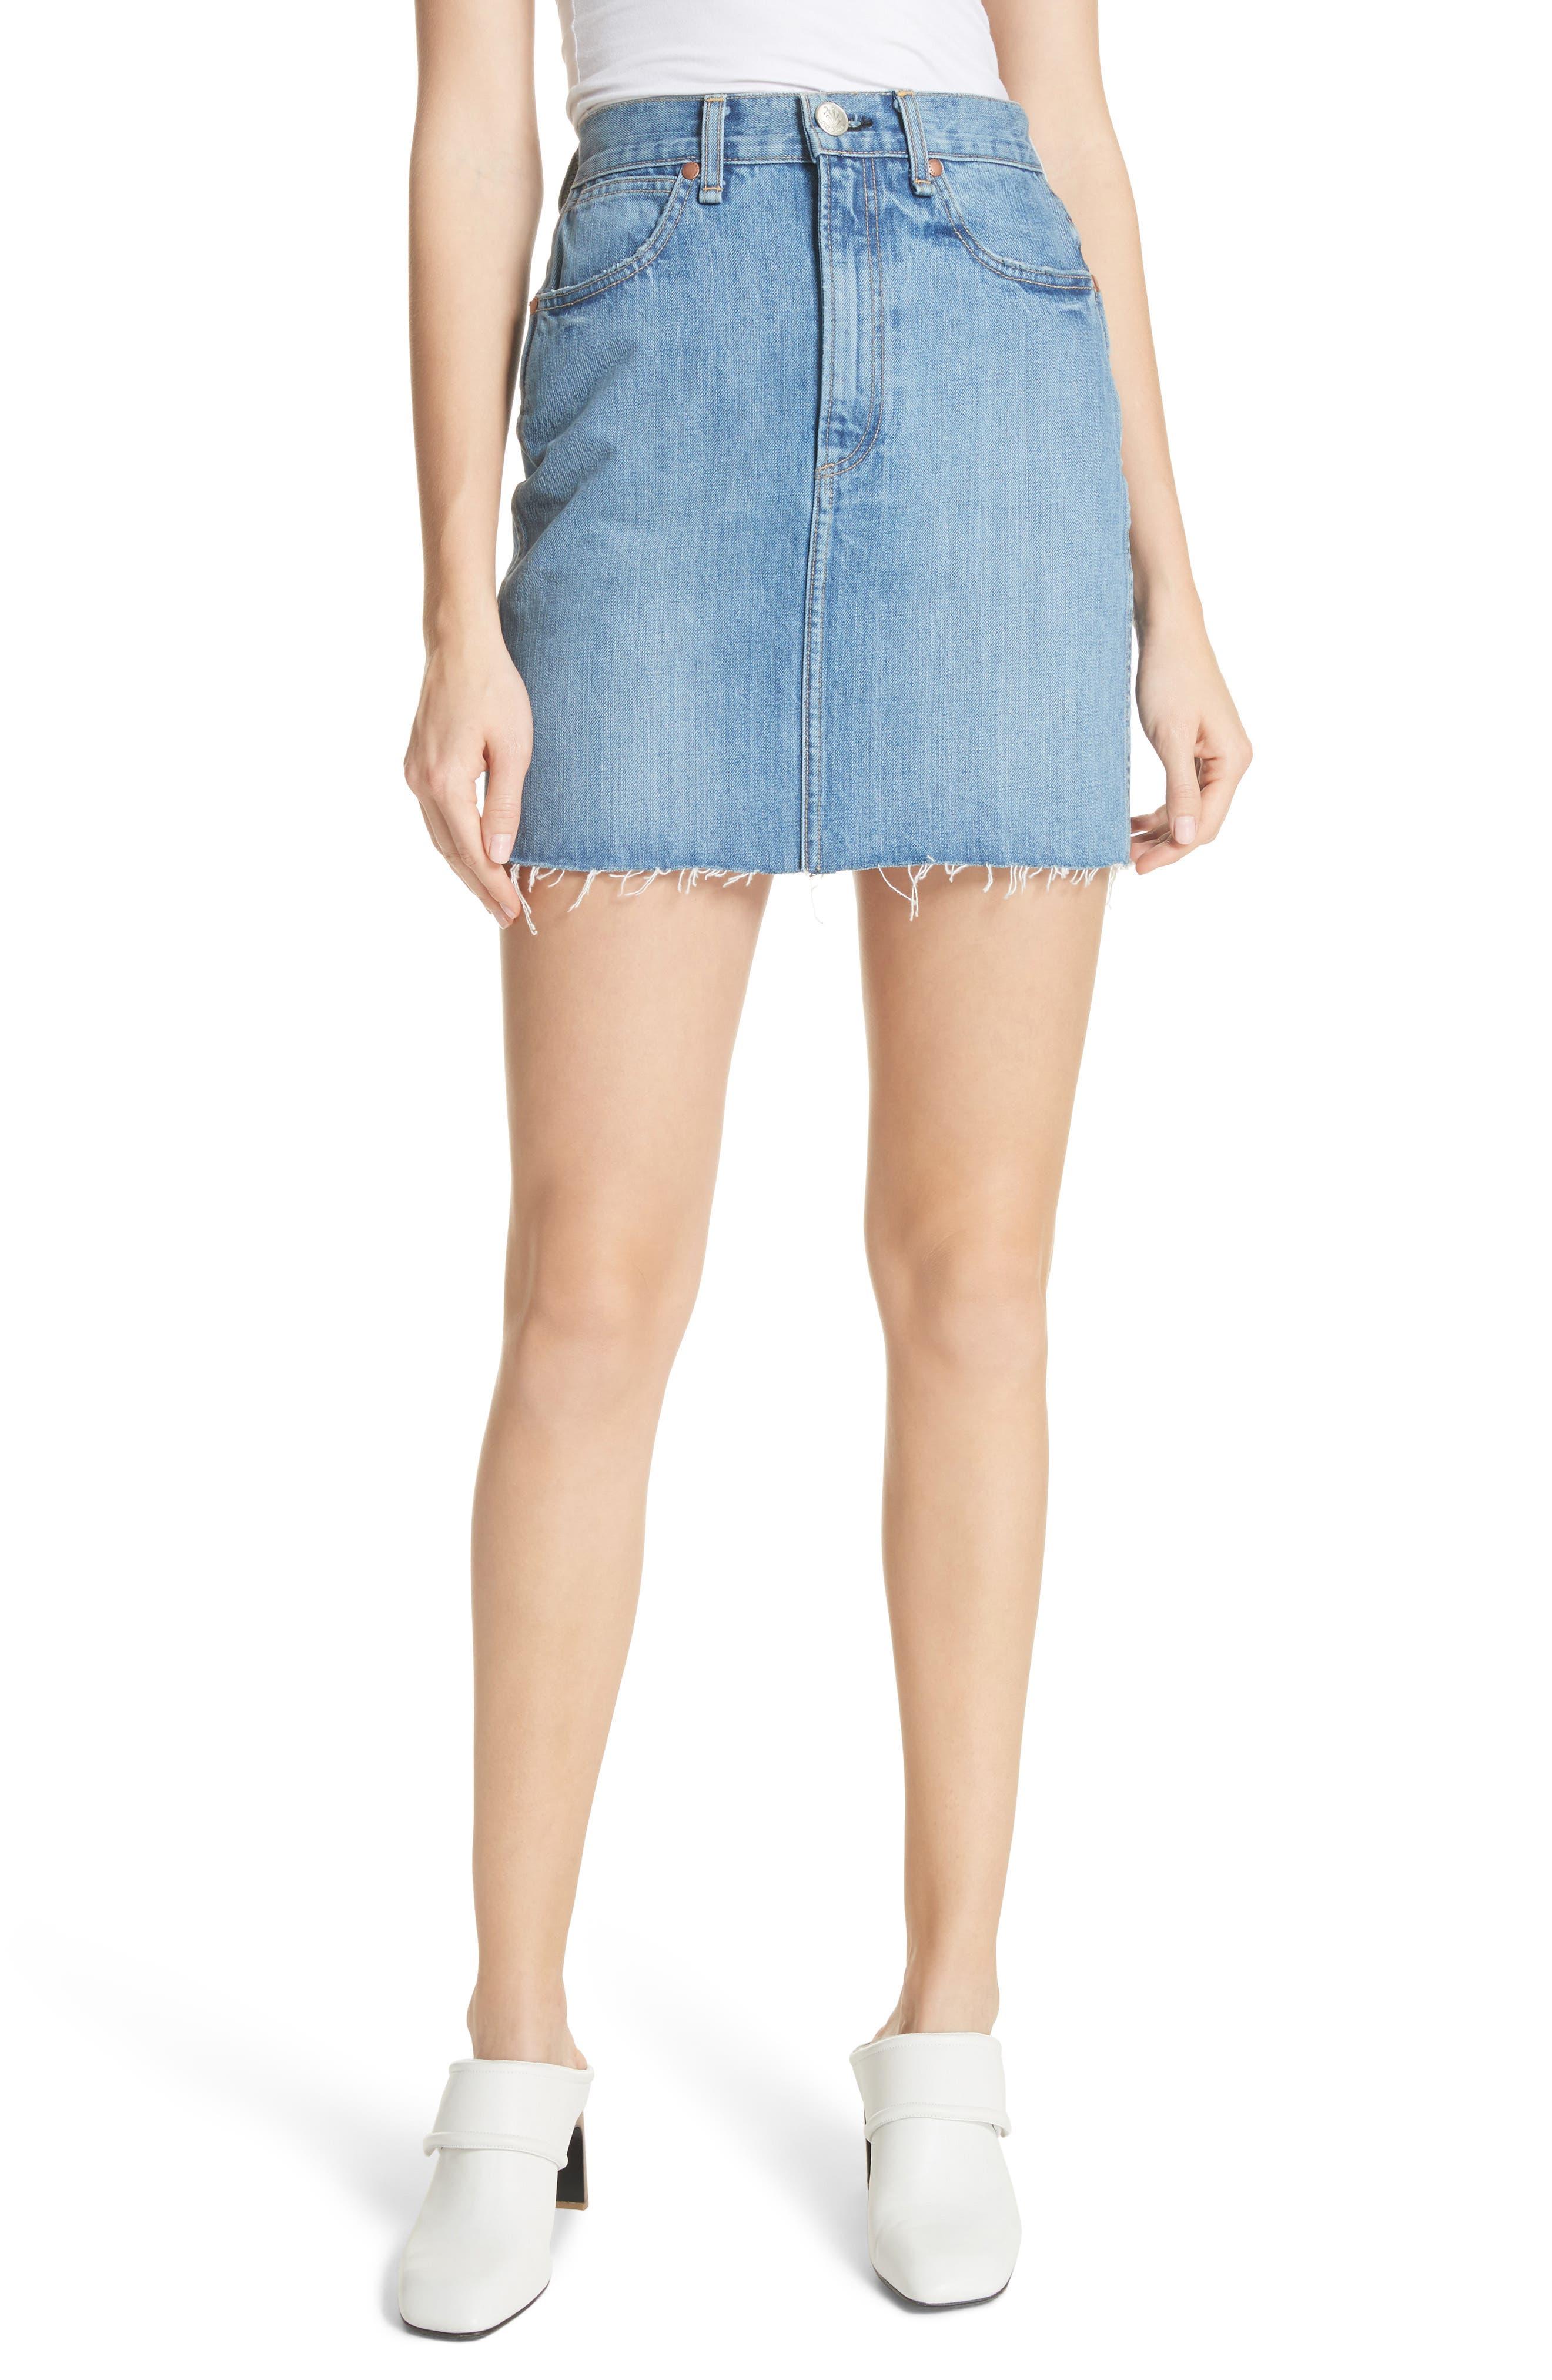 Alternate Image 1 Selected - rag & bone/JEAN Moss High Waist Denim Miniskirt (Clean Levee)